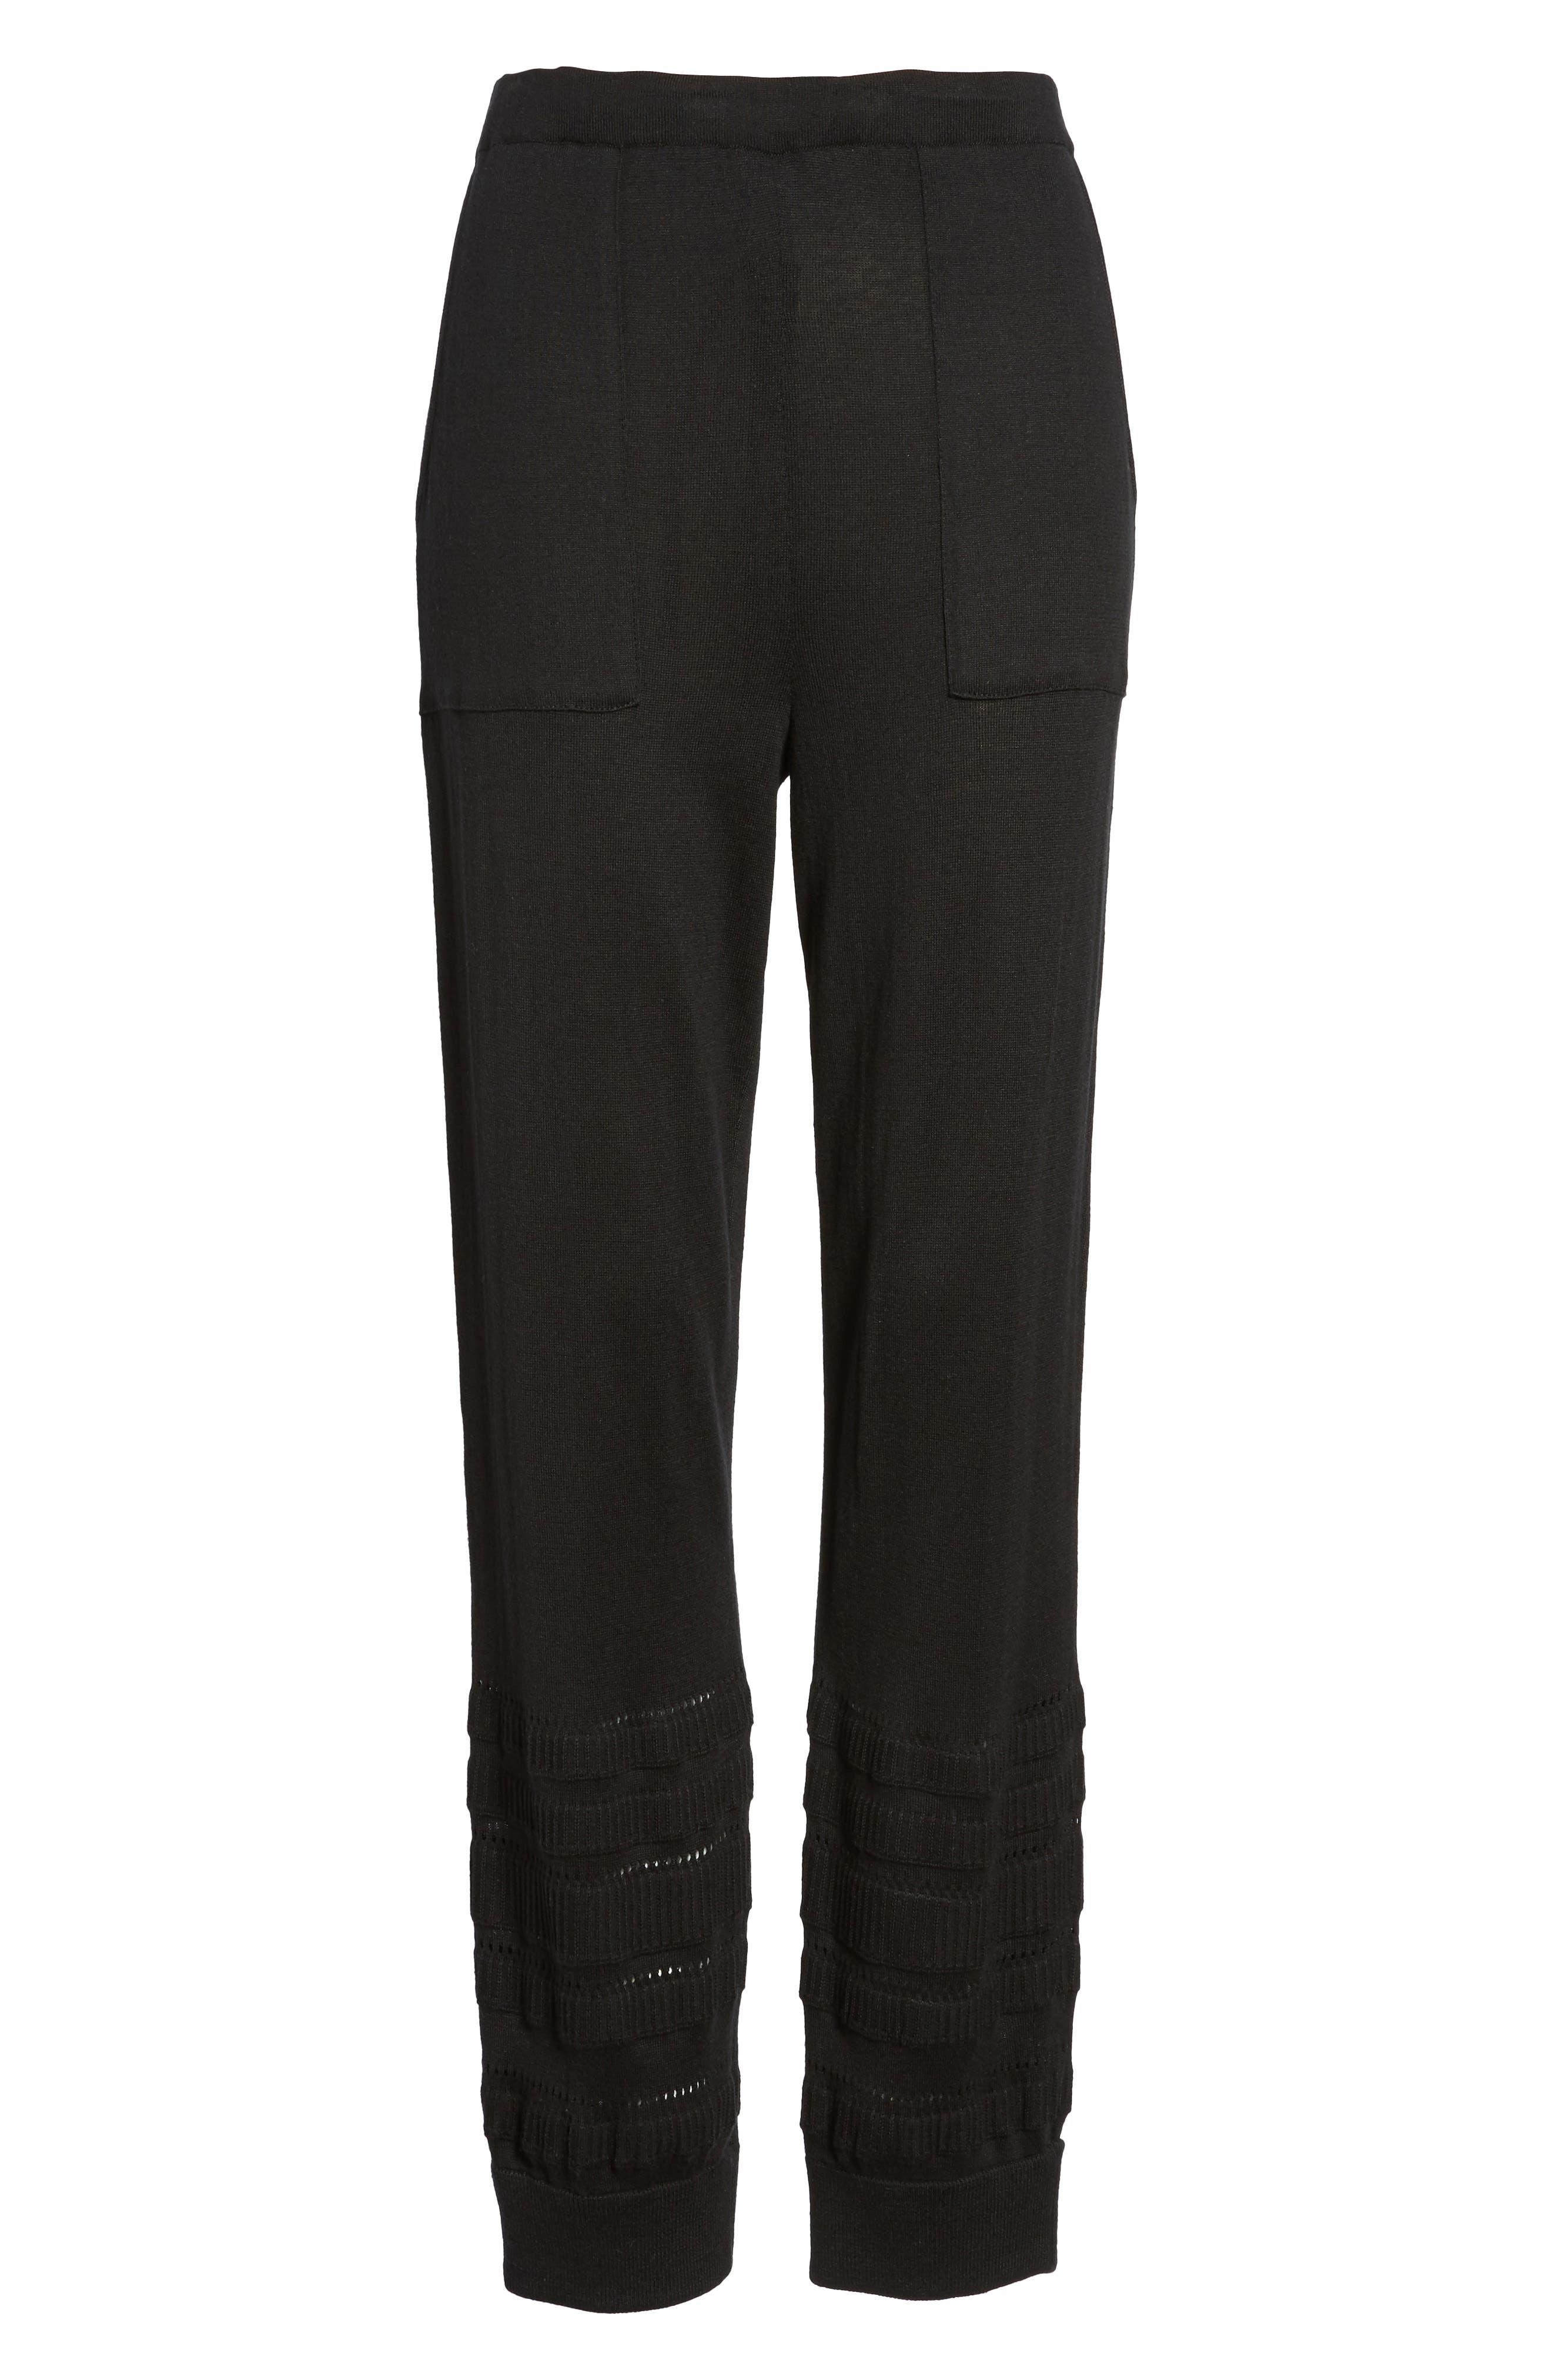 Knit Ankle Pants,                             Alternate thumbnail 7, color,                             Black